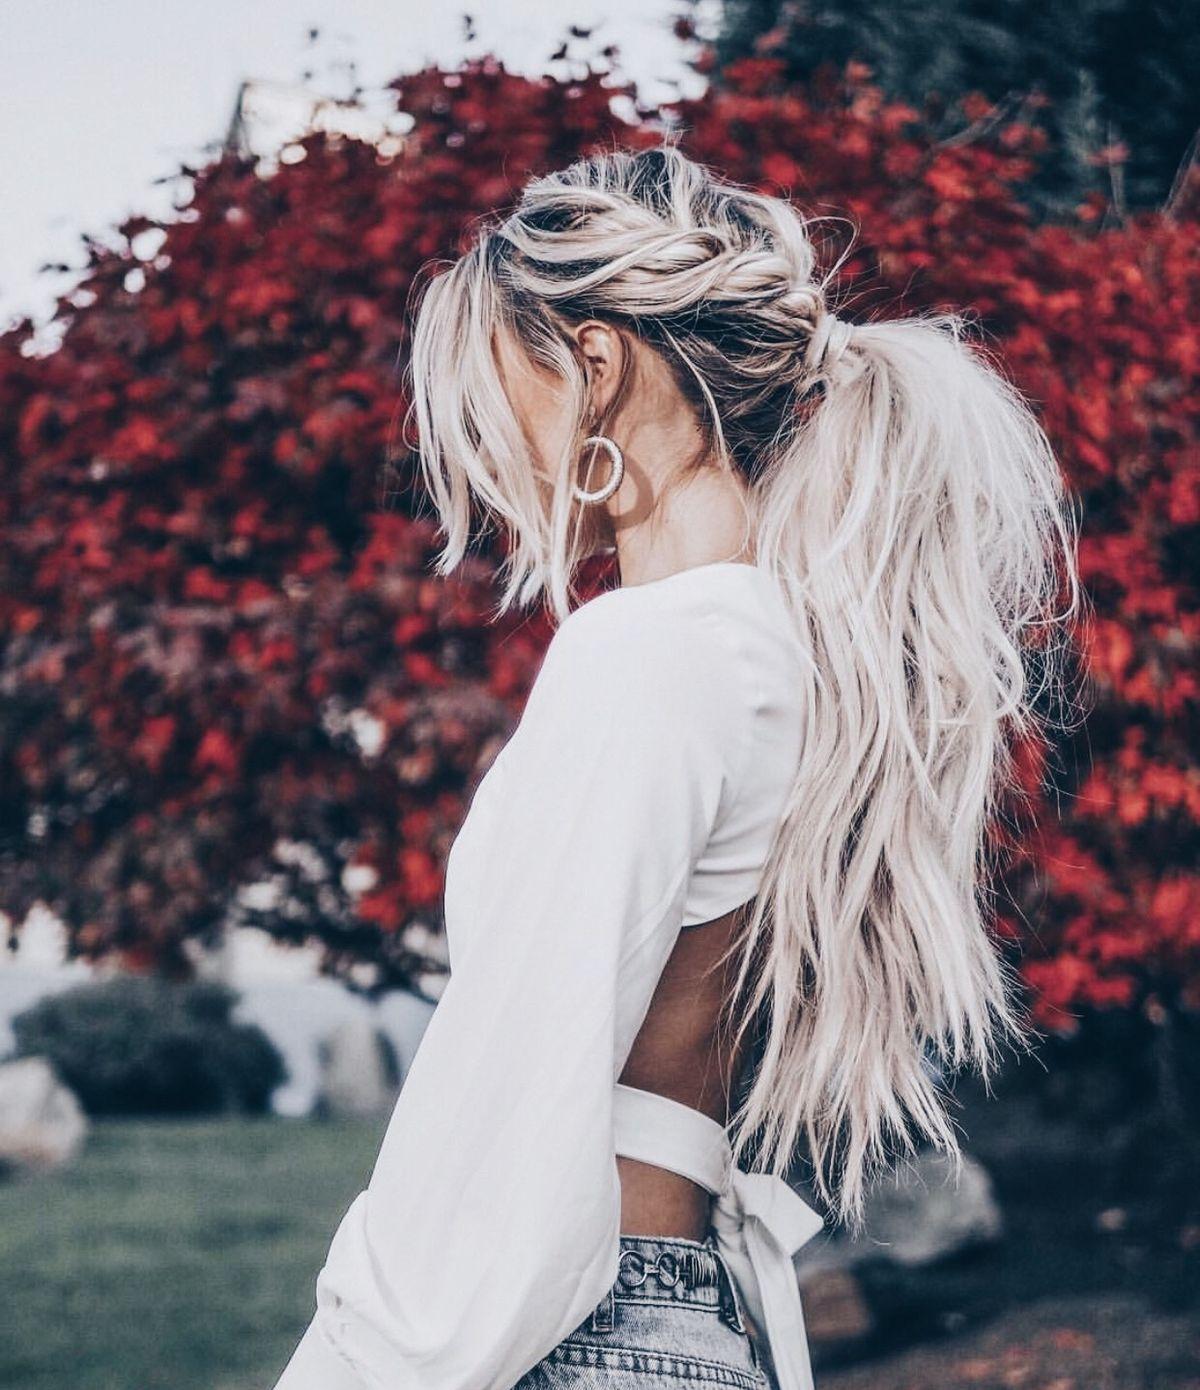 Hair Inspiration 2019-05-15 07:13:08